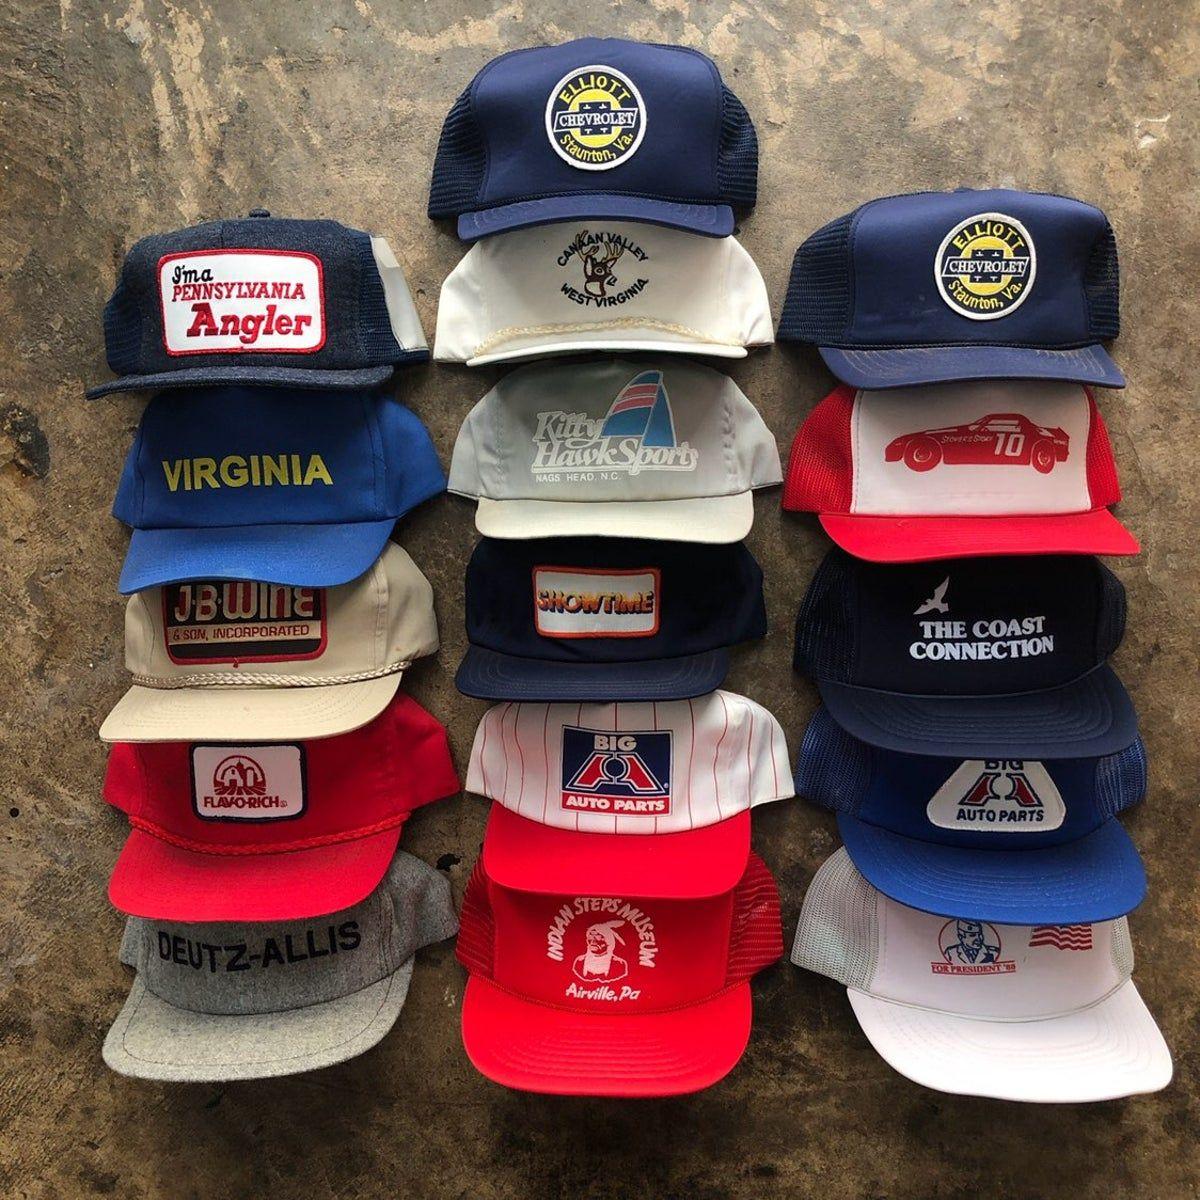 Pin By Francis Rutledge On Feels Like Summer In 2021 Vintage Trucker Hats Hats Vintage Cap